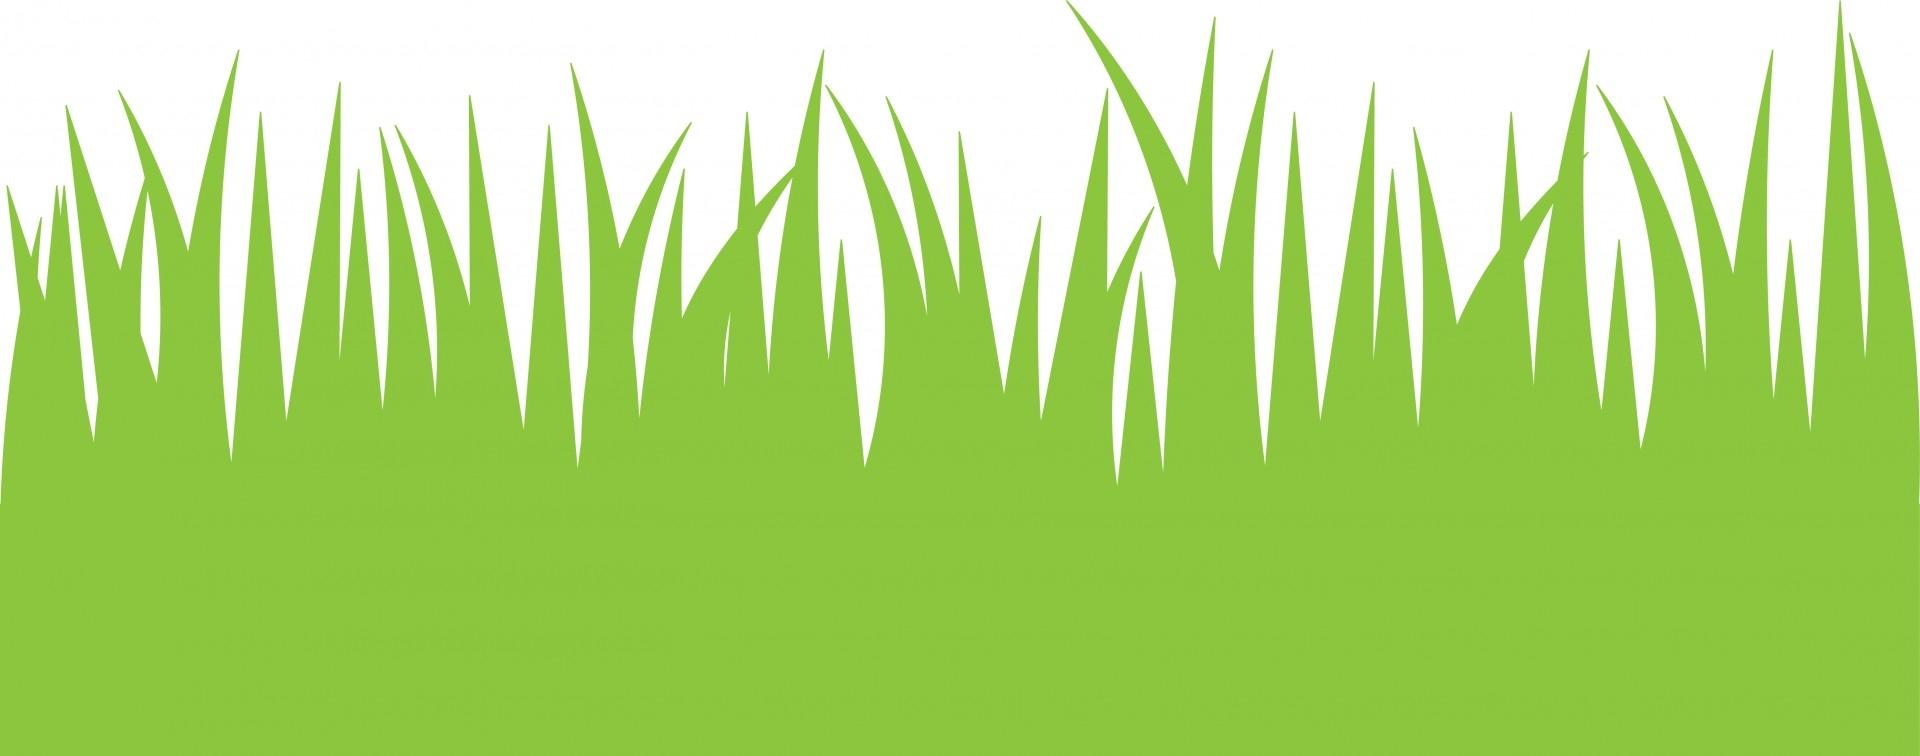 Grass Clipart No Background.